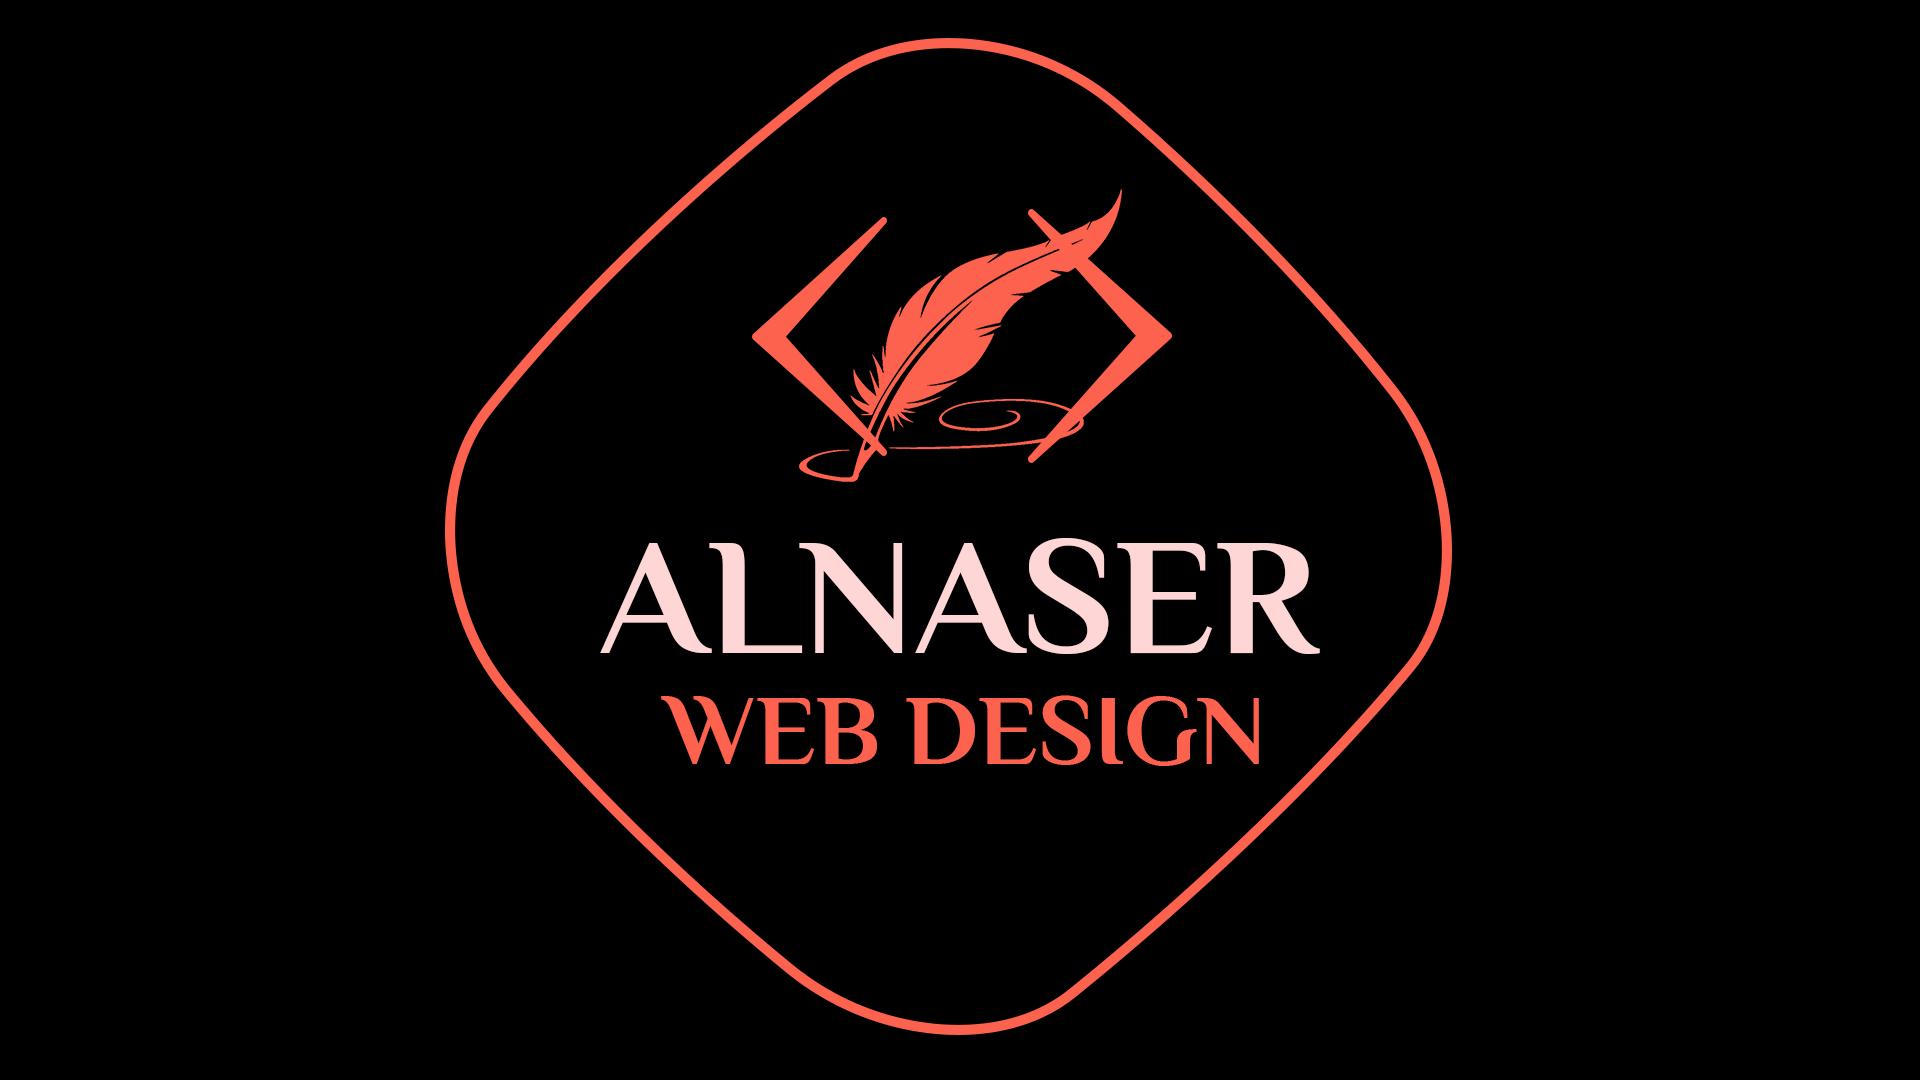 new alnaser web design logo